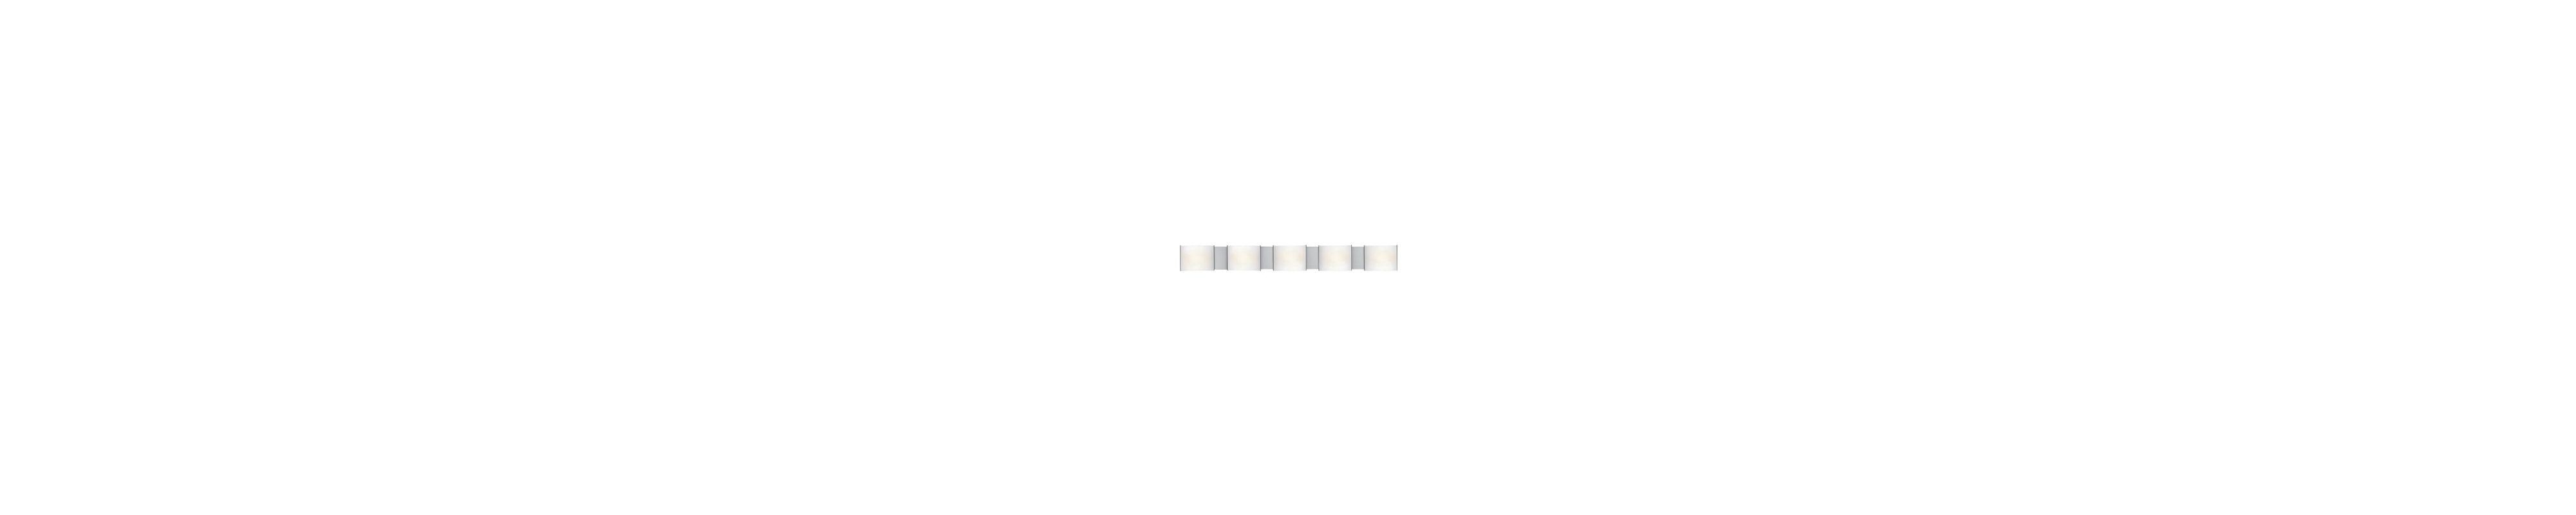 Access Lighting 62262-CH/FST Chrome Contemporary Nitro Bathroom Light